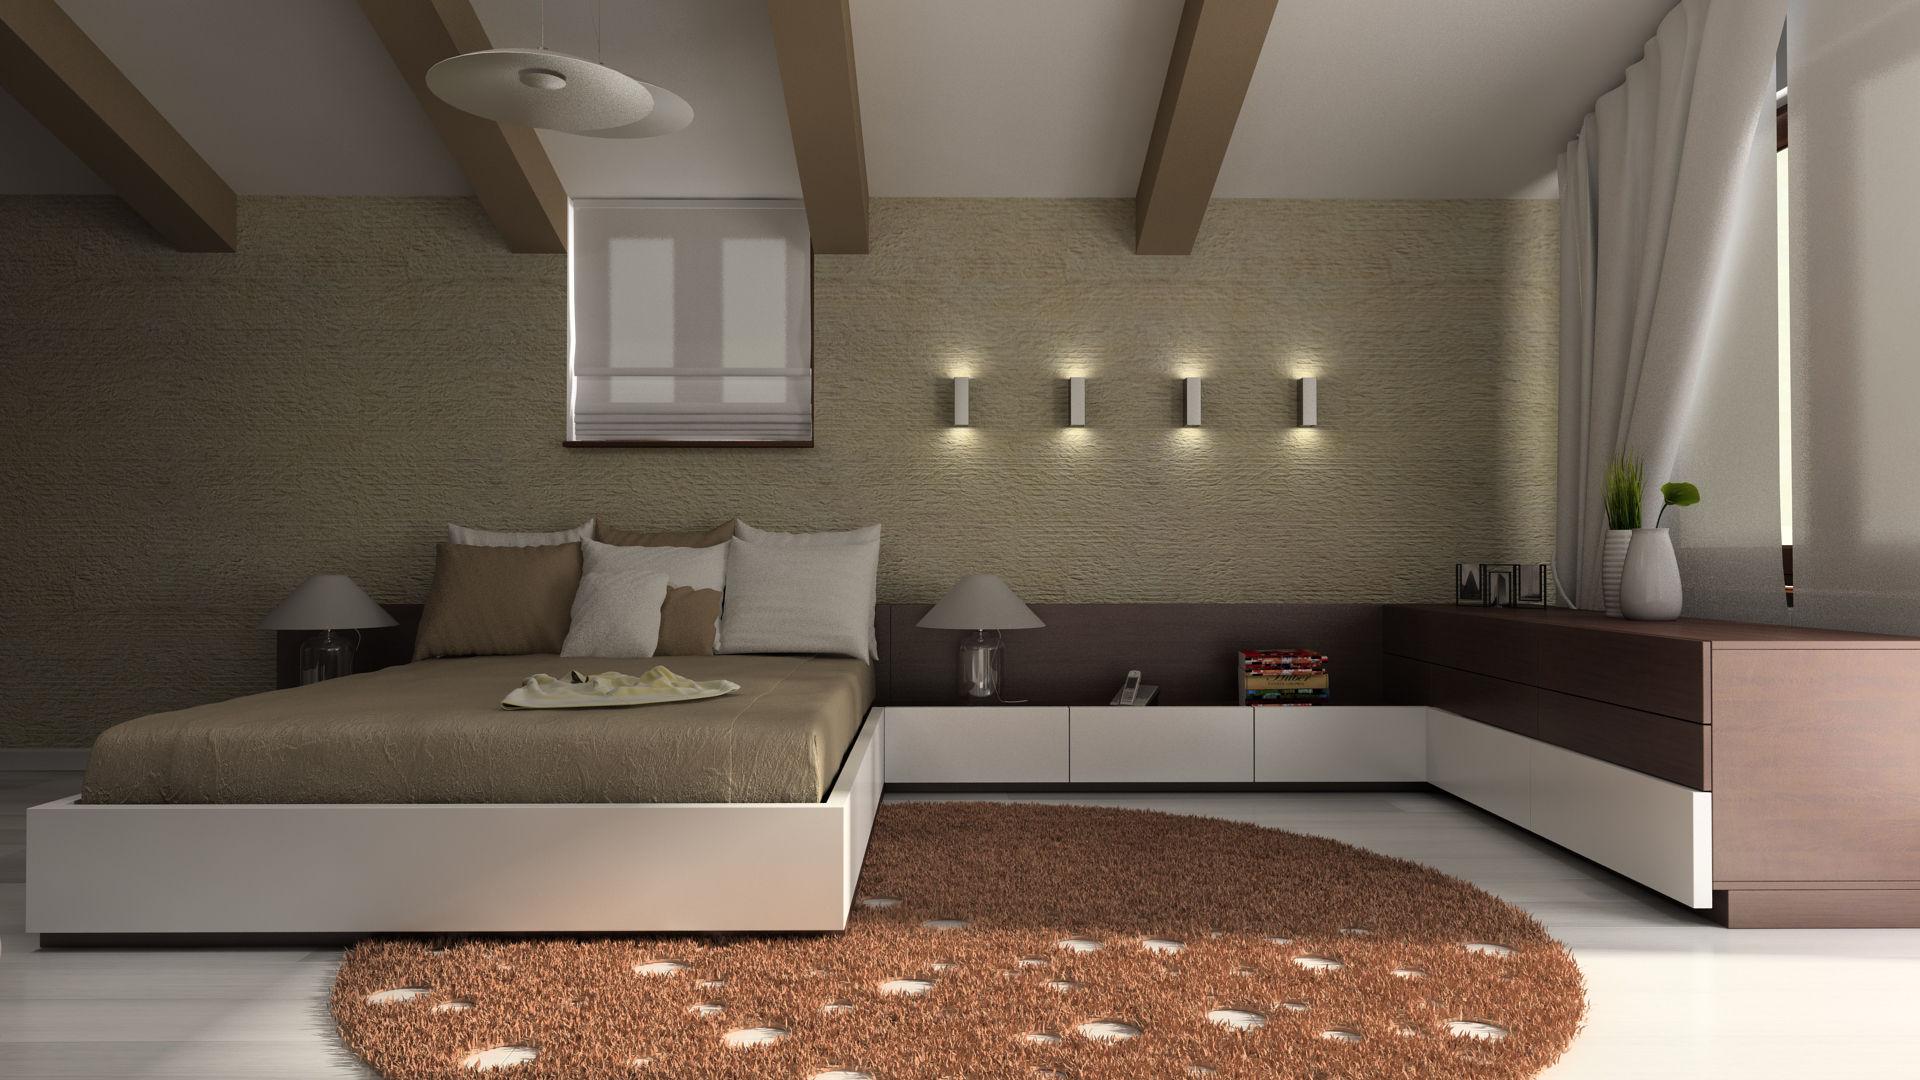 hd home interior 2015 grasscloth wallpaper - Interior Design Wall Paper